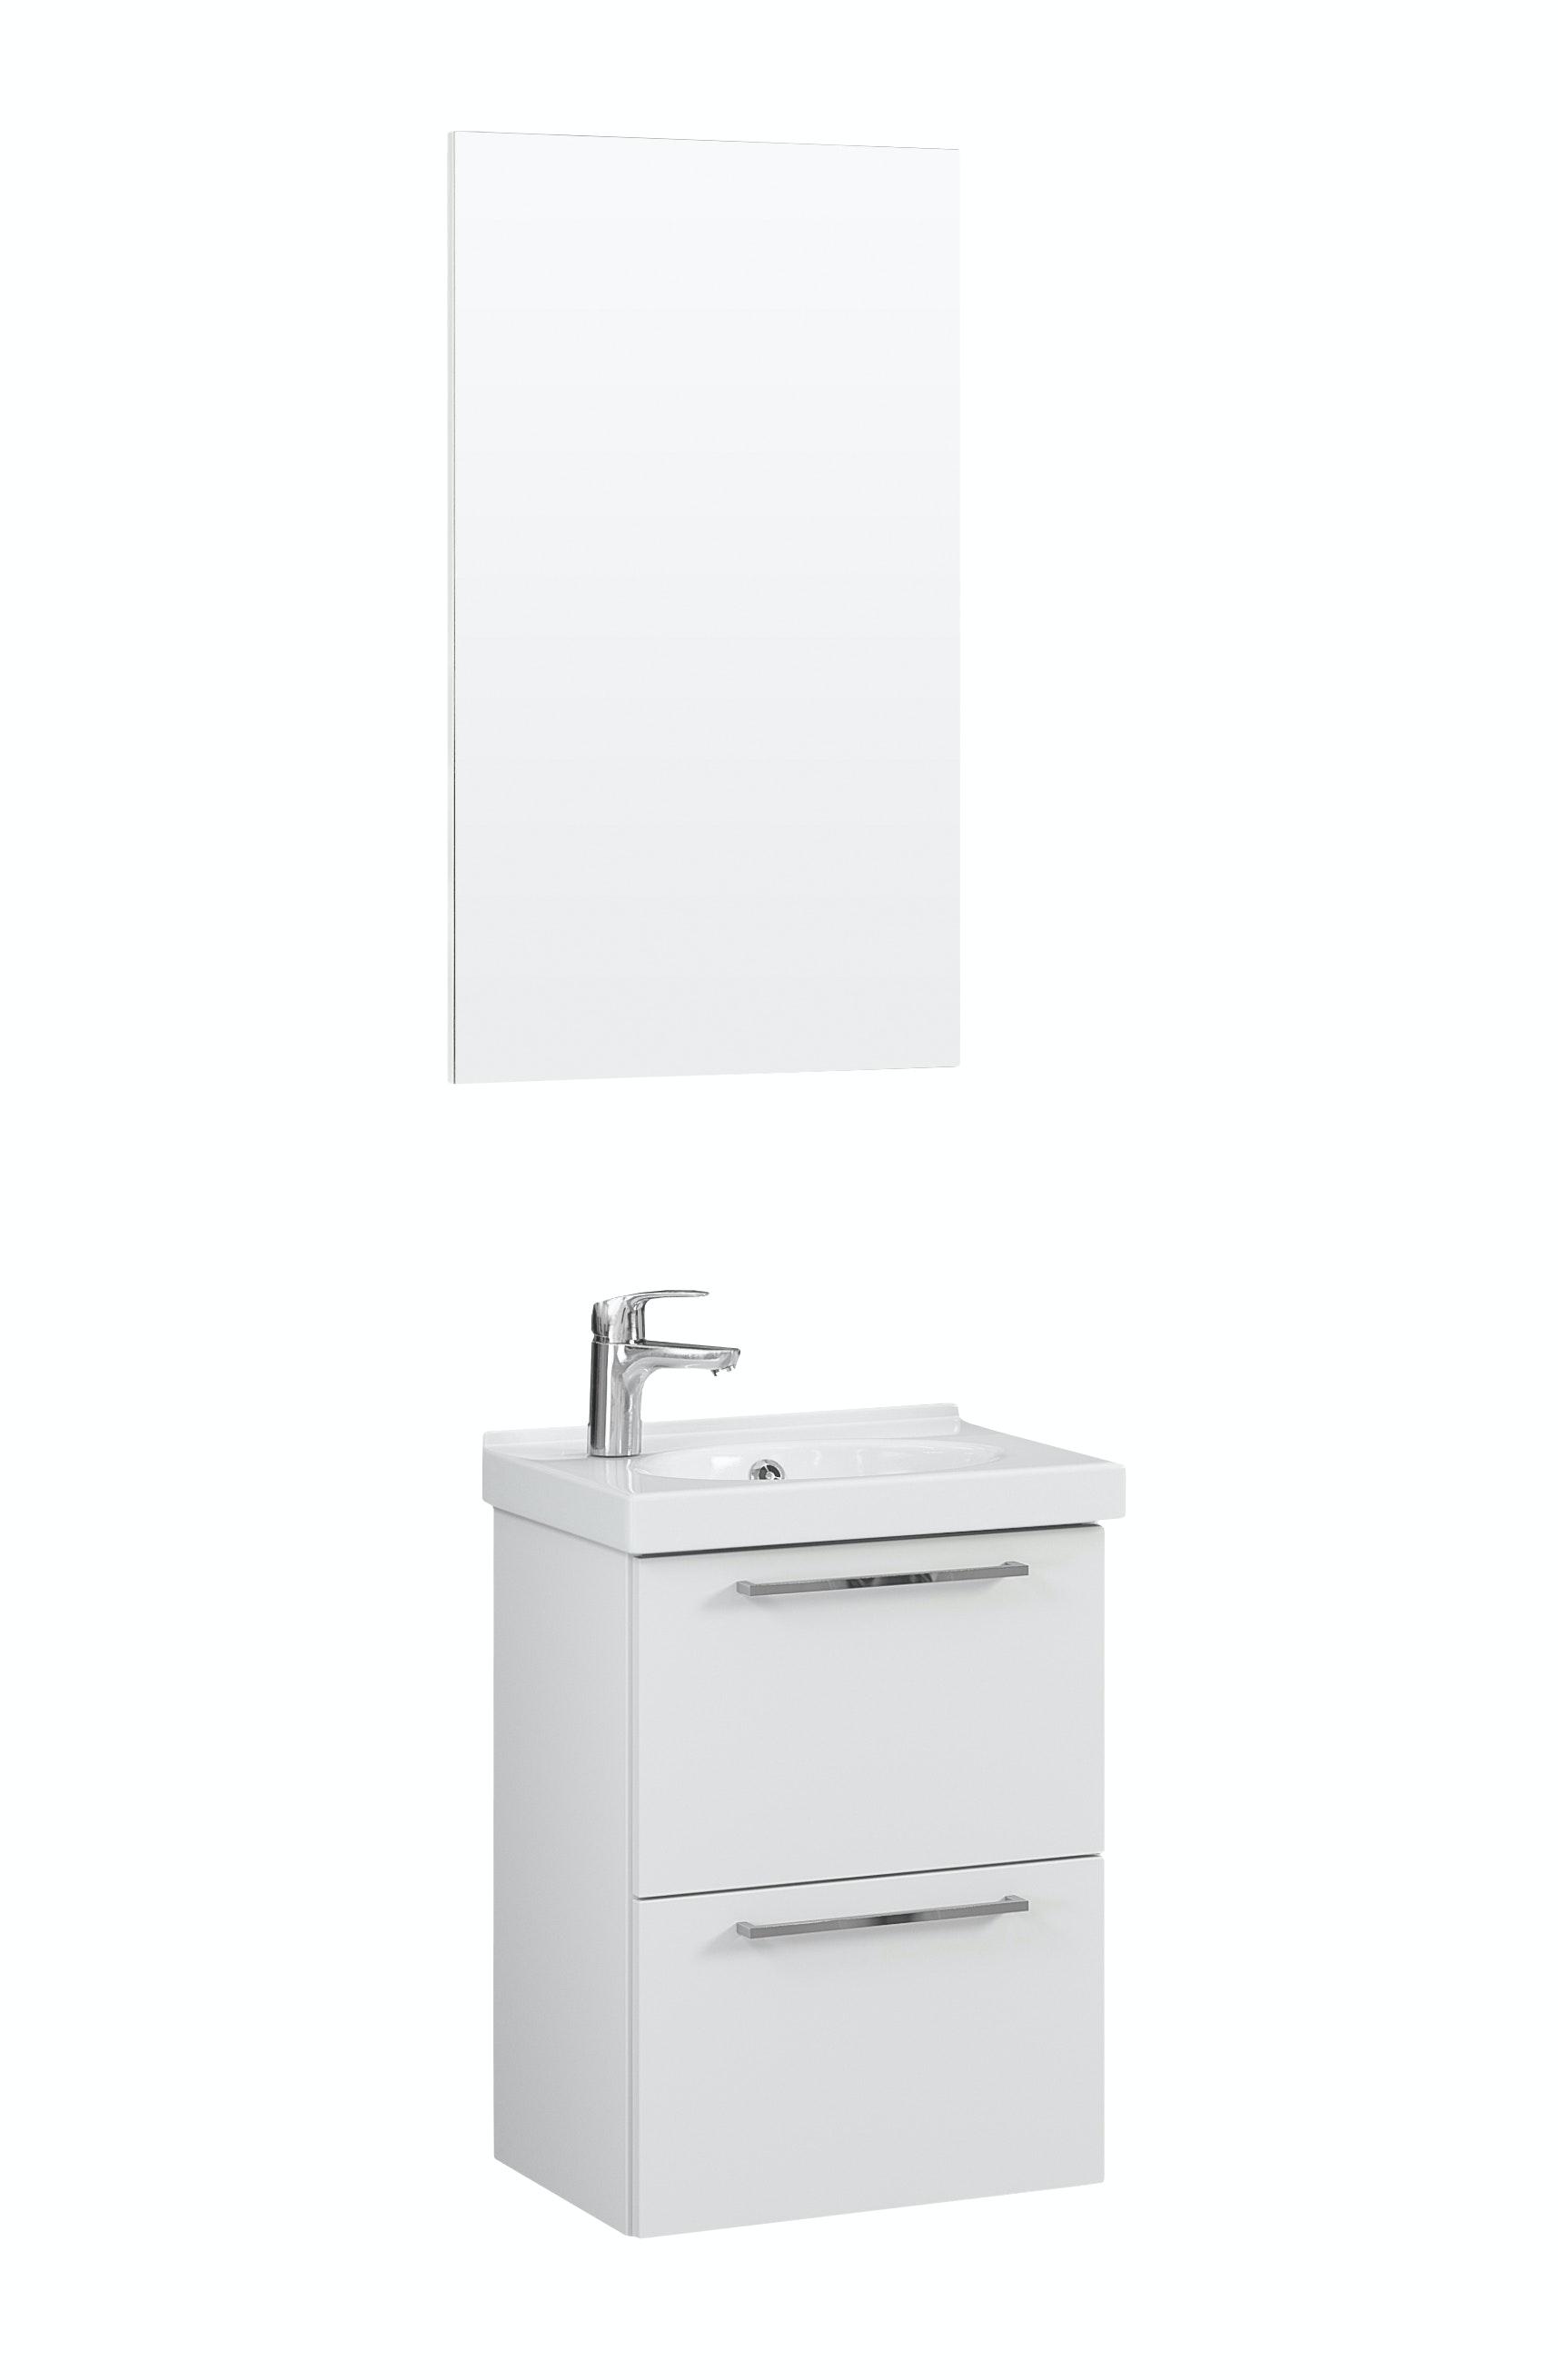 Möbelpaket Temal Trend 57X40 Högblank Vit Med Spegel